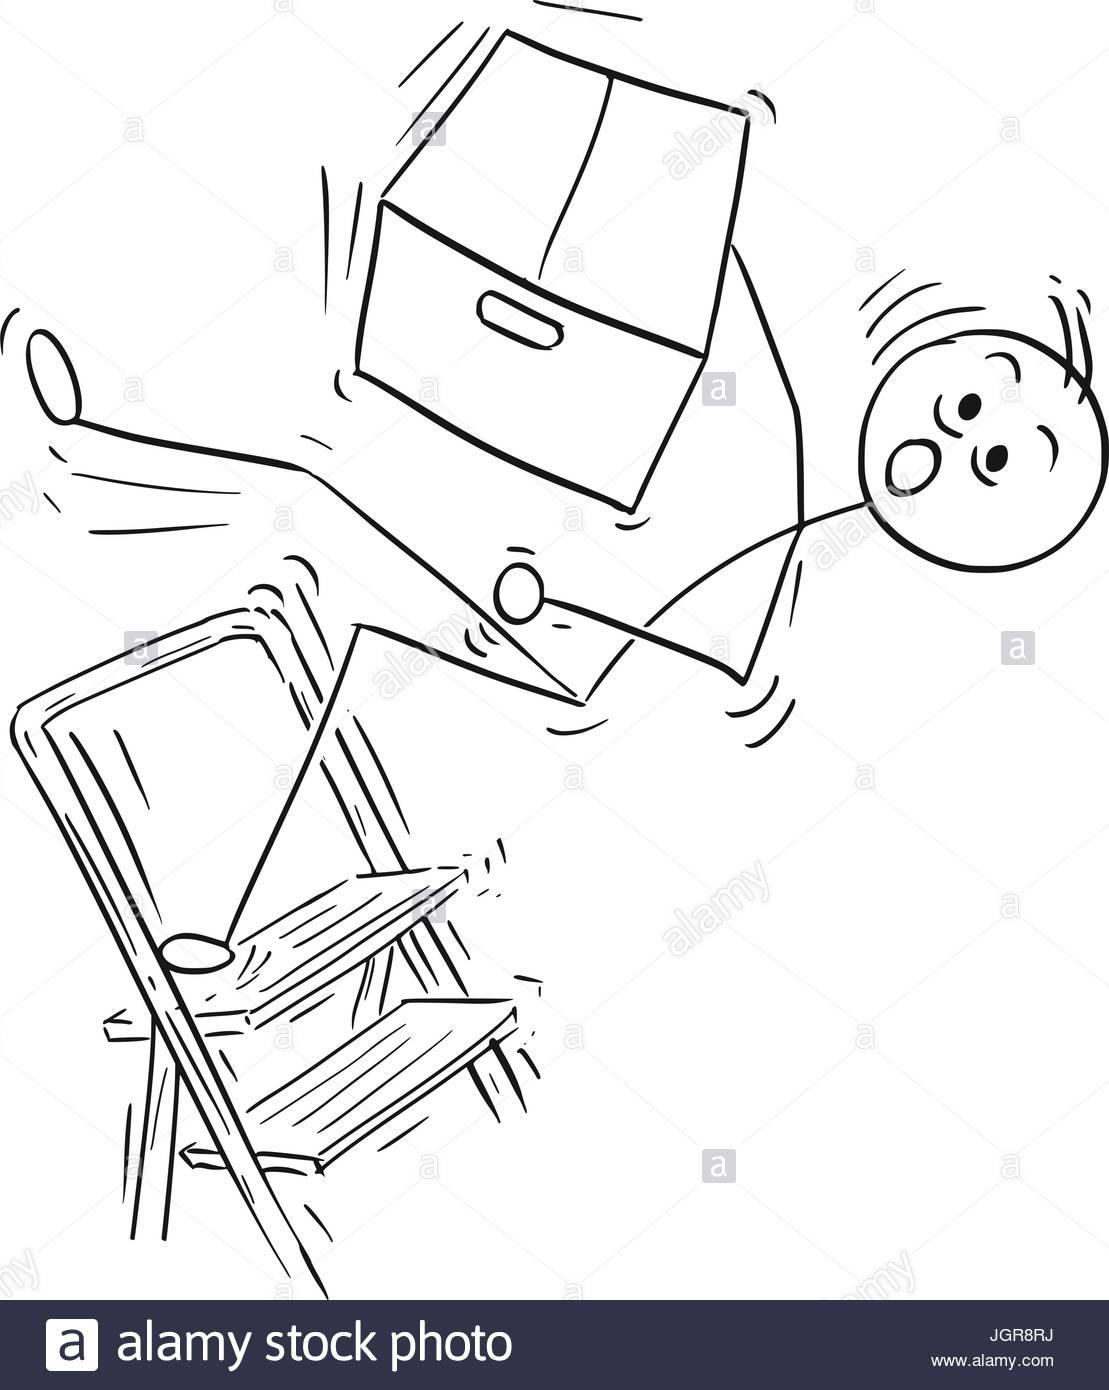 1109x1390 Cartoon Vector Stick Man Stickman Drawing Of Man Holding Large